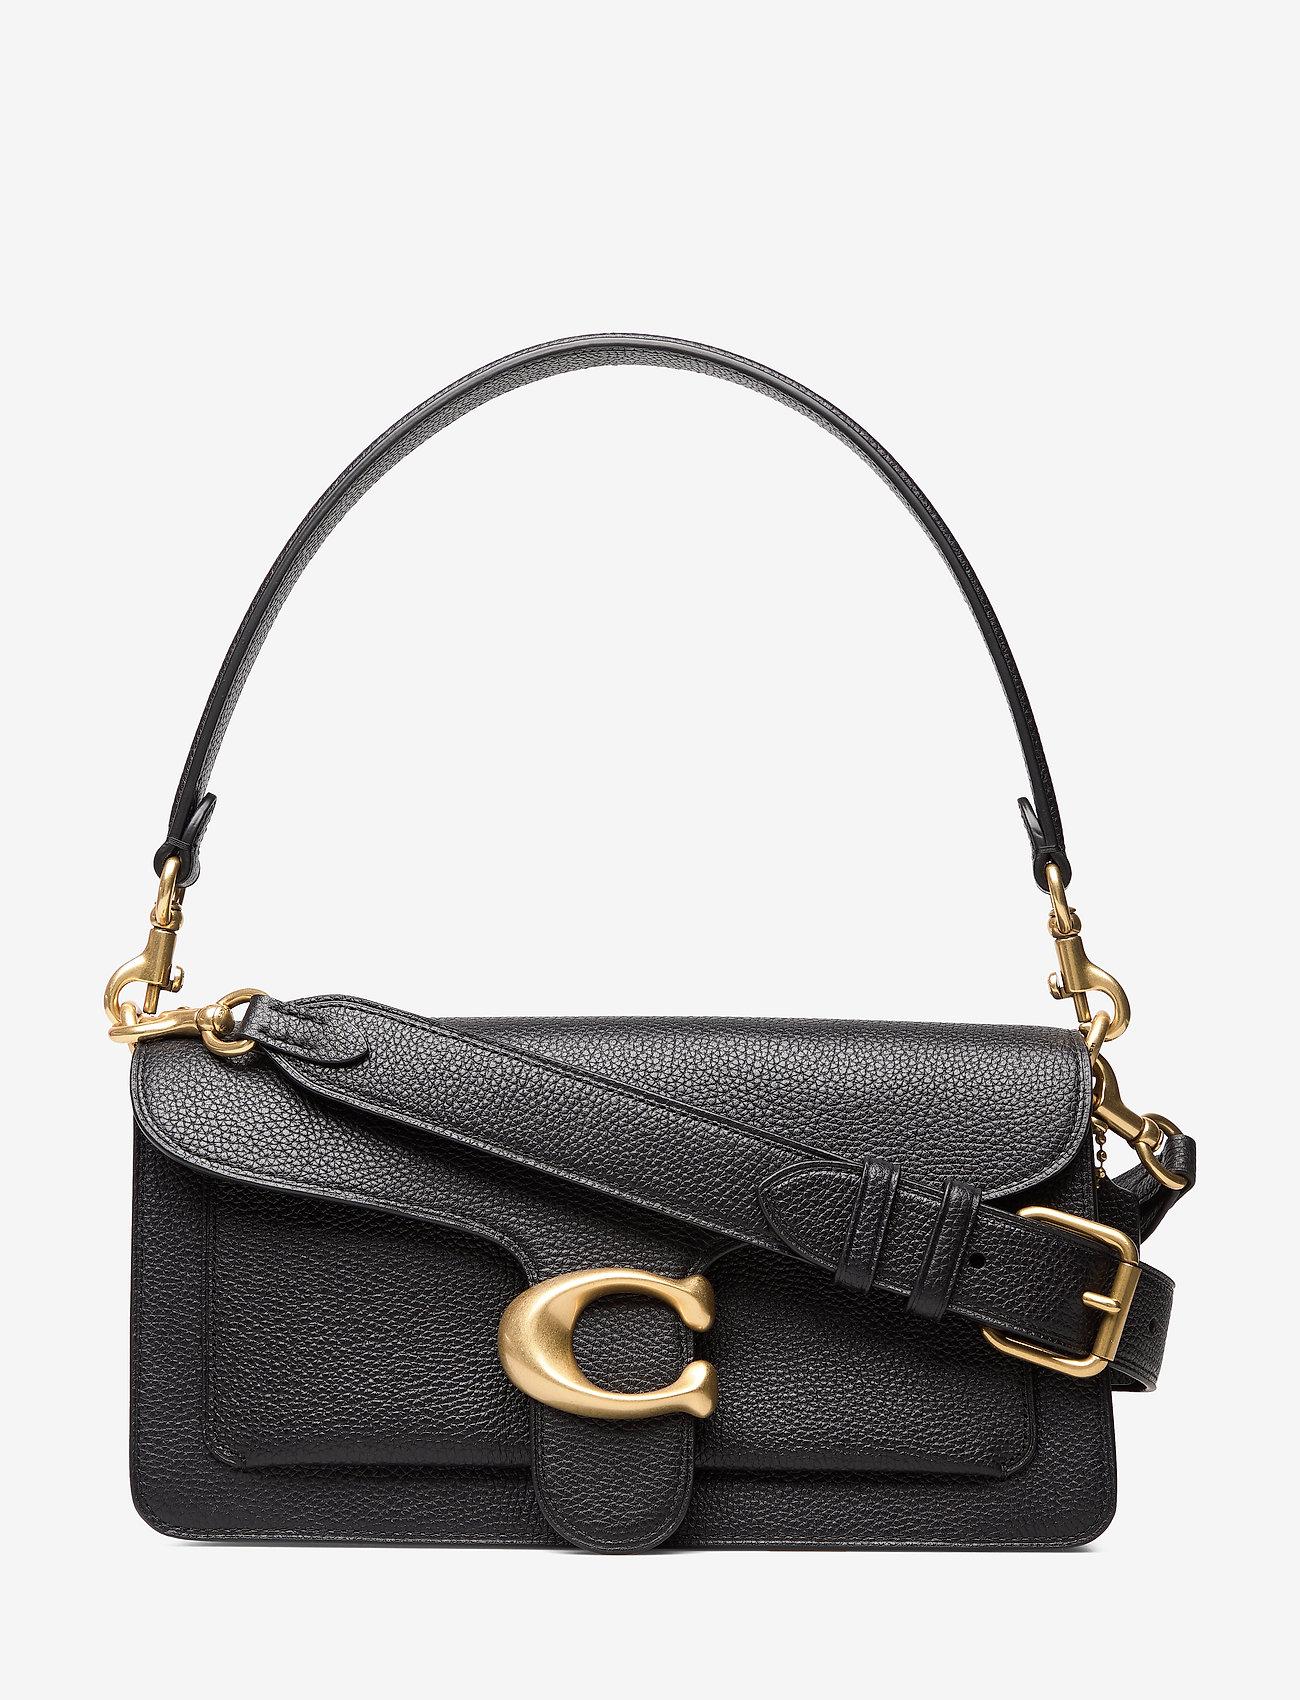 Coach - Polished Pebble Leather Tabby Shoulder Bag 26 - top handle - b4/black 2